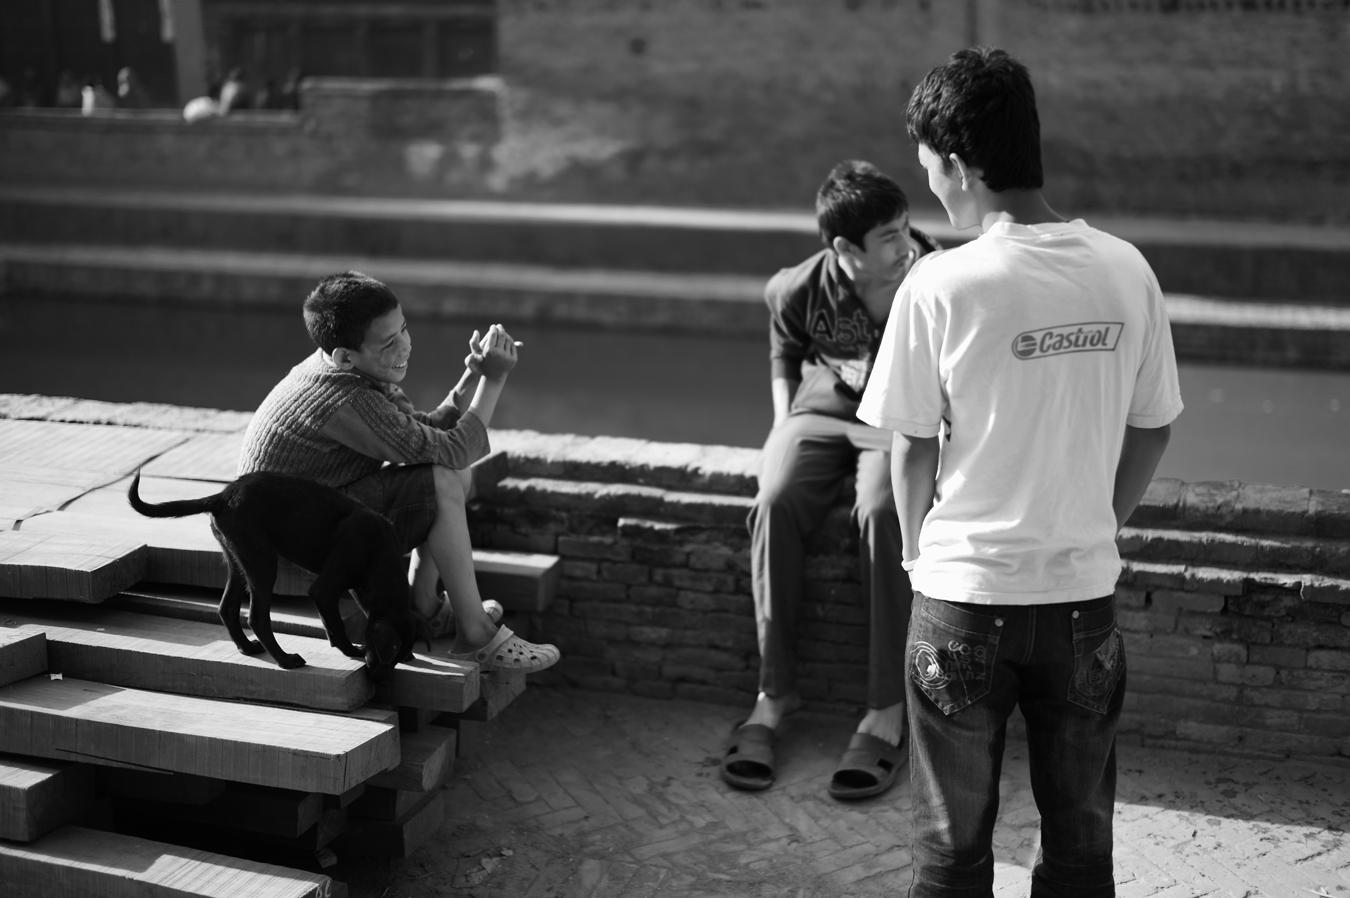 Bhaktapurにて_c0116732_21182850.jpg